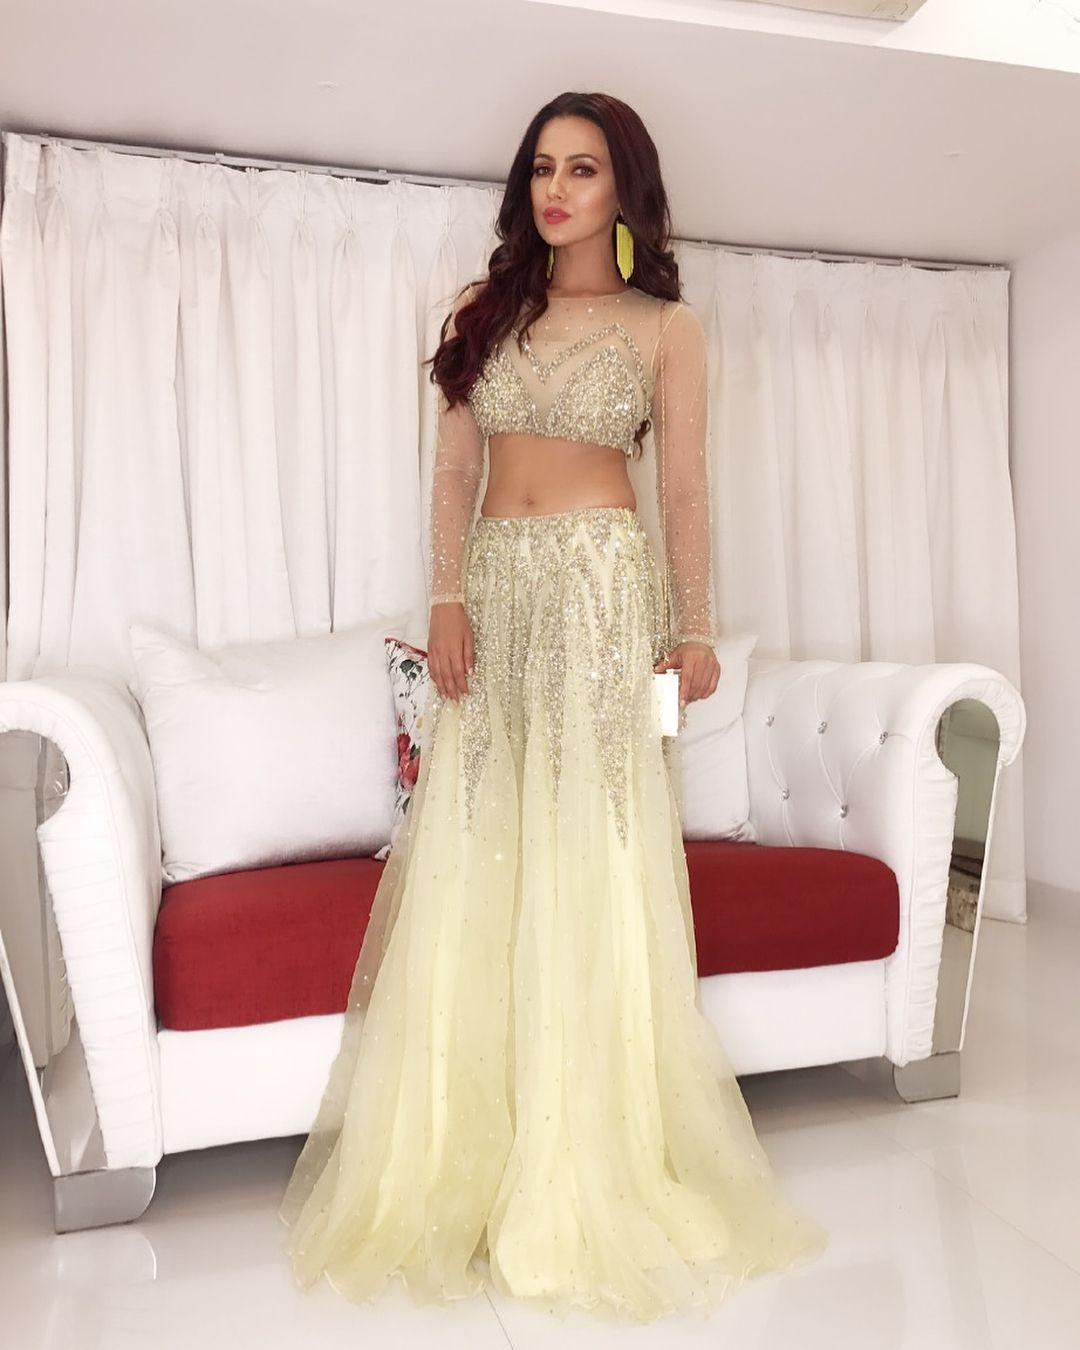 Sana Khan Indian designer wear, Indian bridal, Fashion